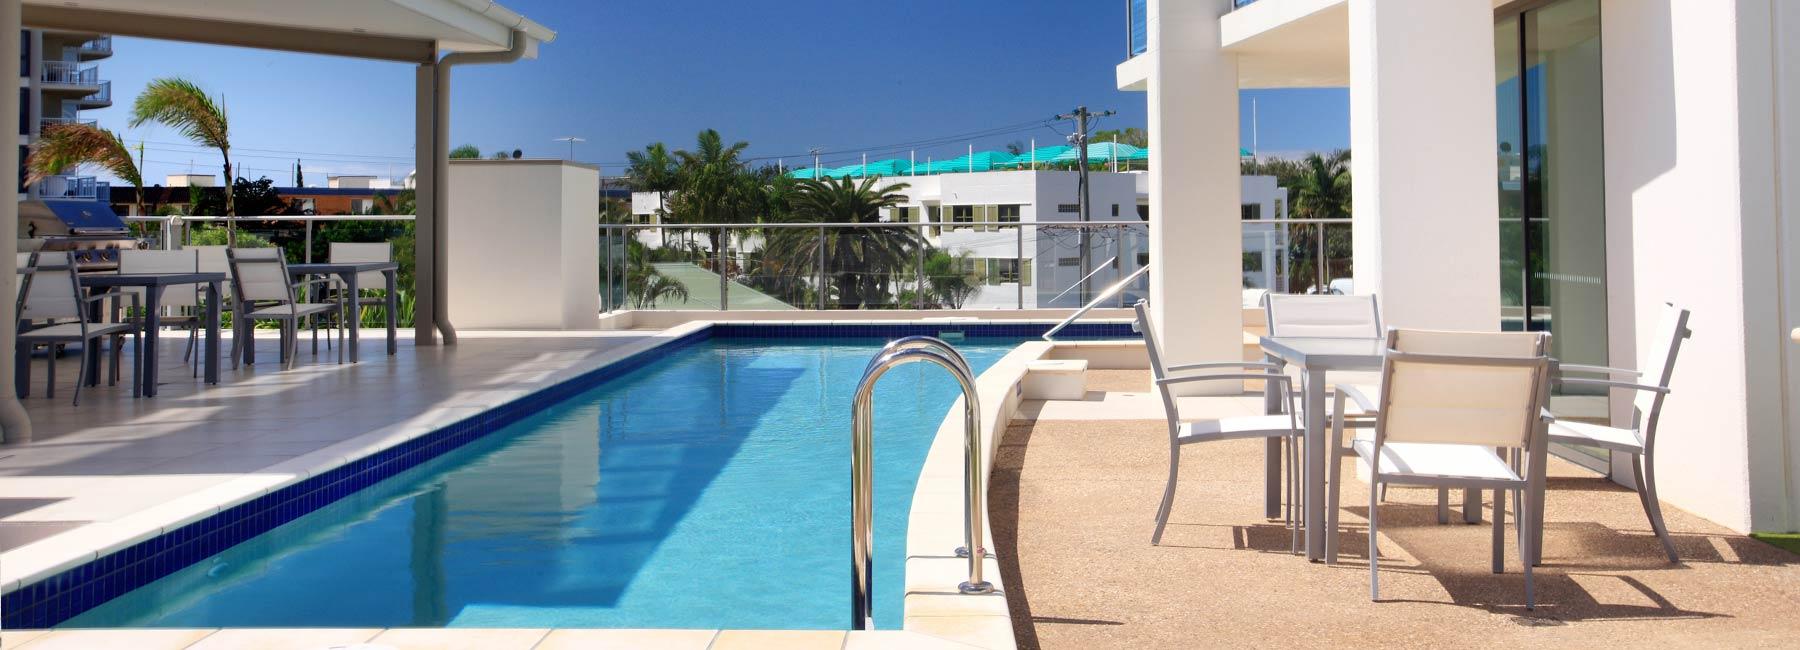 maroochydore resort facilities beach on sixth. Black Bedroom Furniture Sets. Home Design Ideas